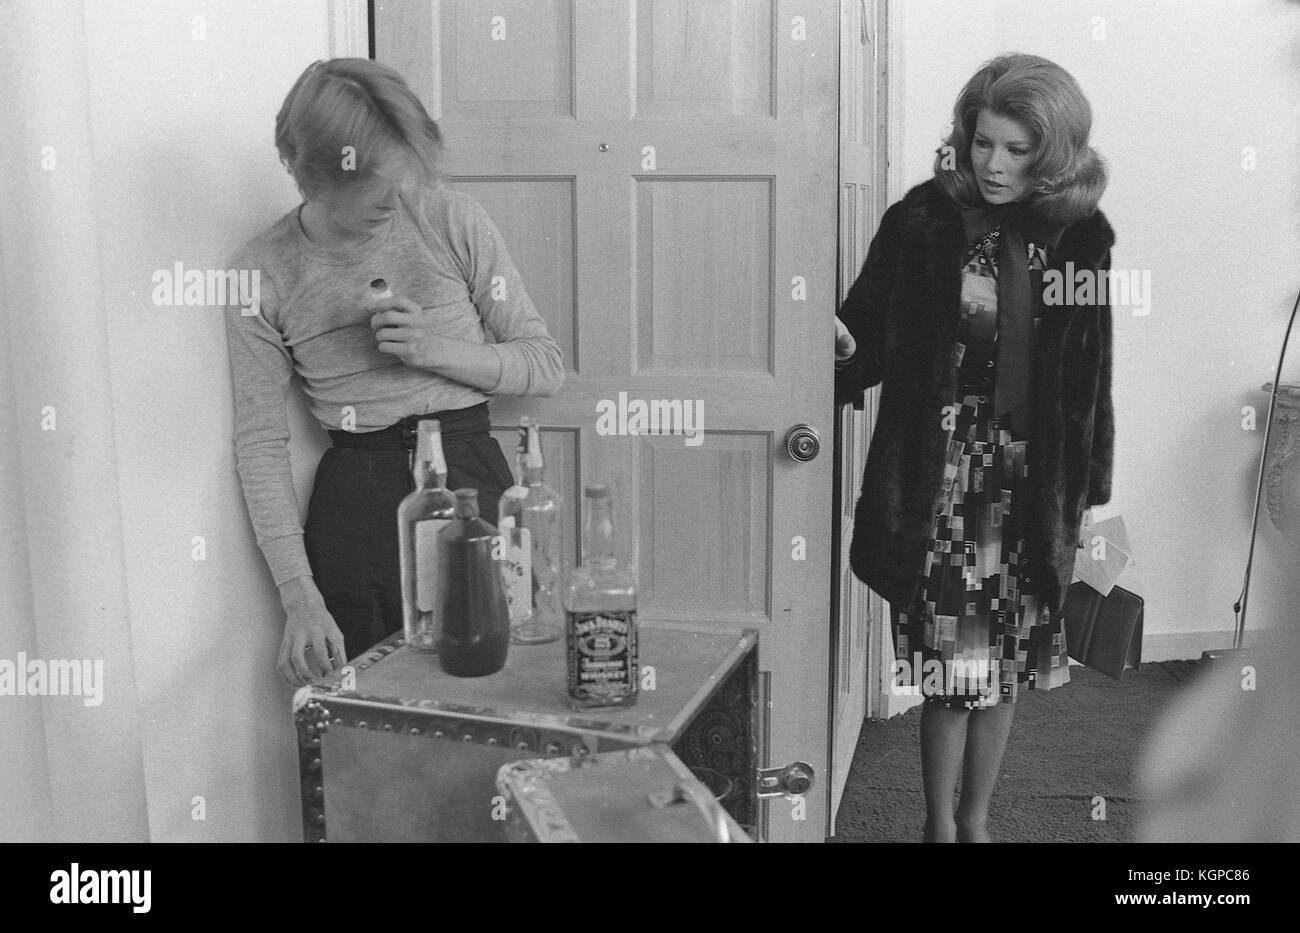 Watch Claudine Barretto (b. 1979) video